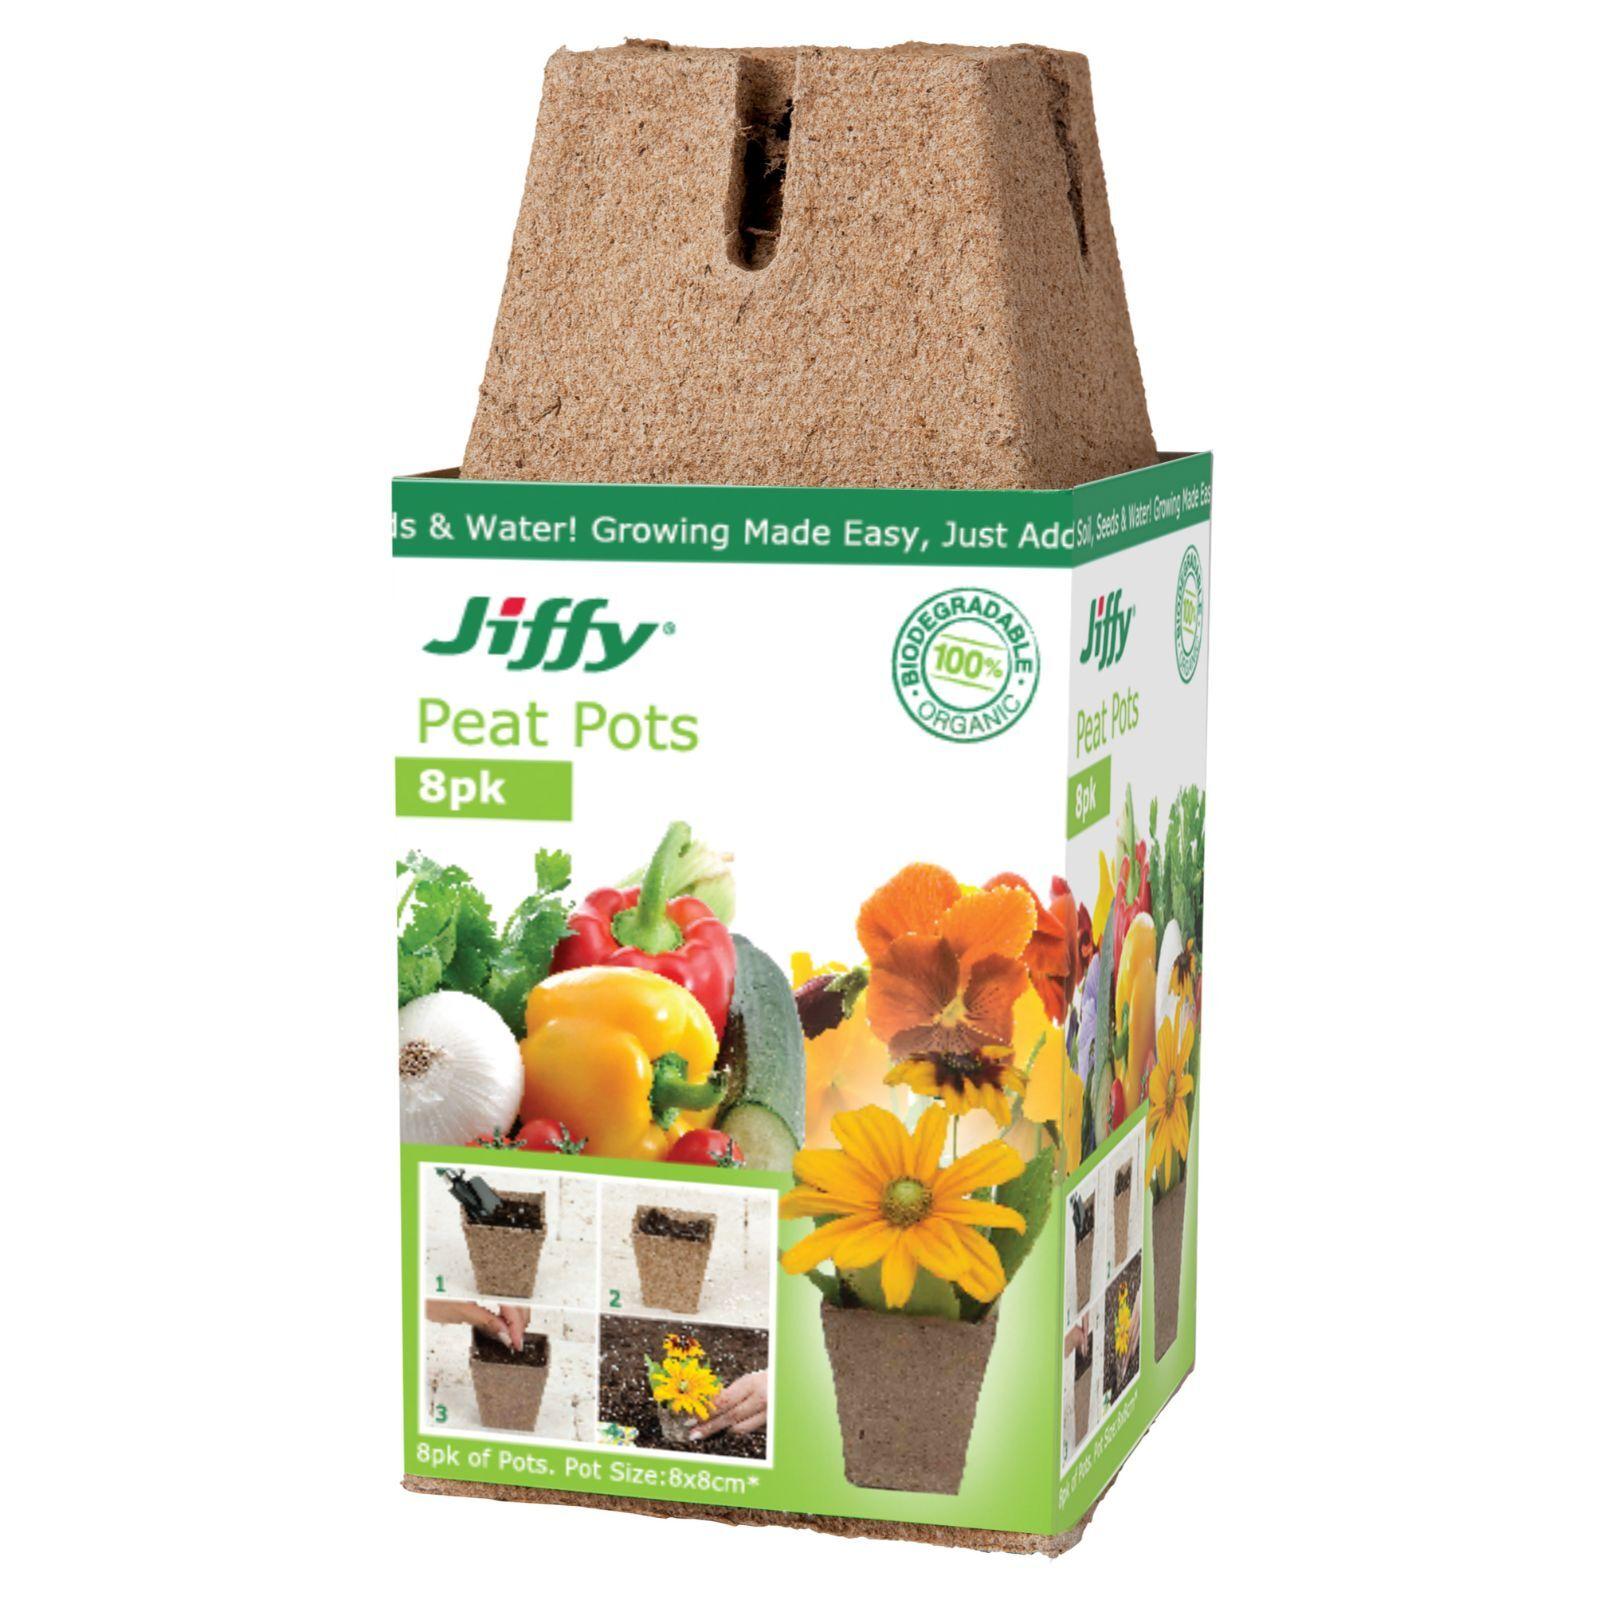 Mr Fothergill's 8cm Jiffy Square Peat Propagation Pots - 8 Pack